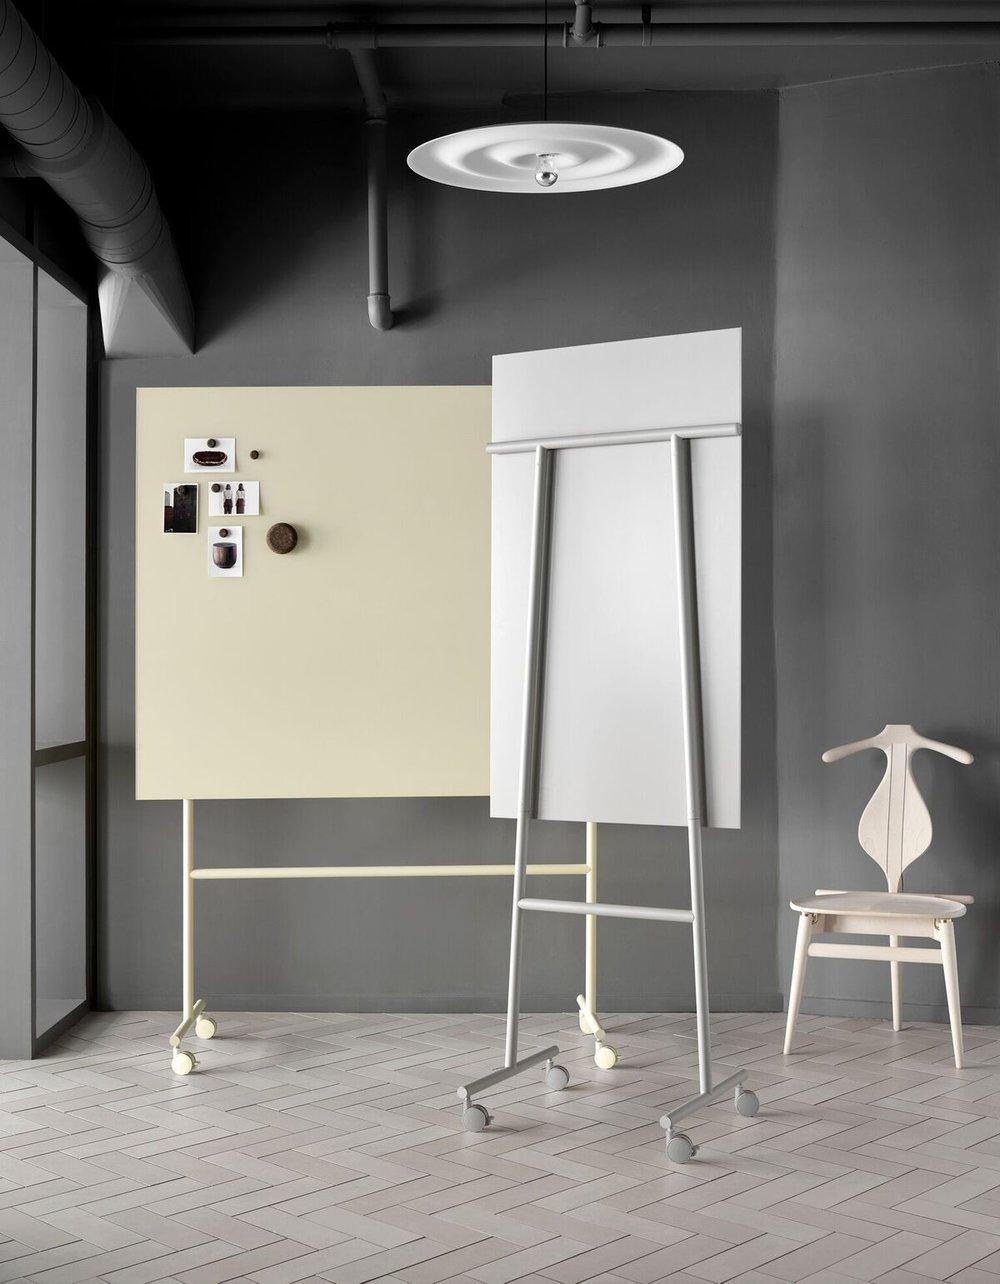 Lintex Mono, Design Christian Halleröd, ©Lintex